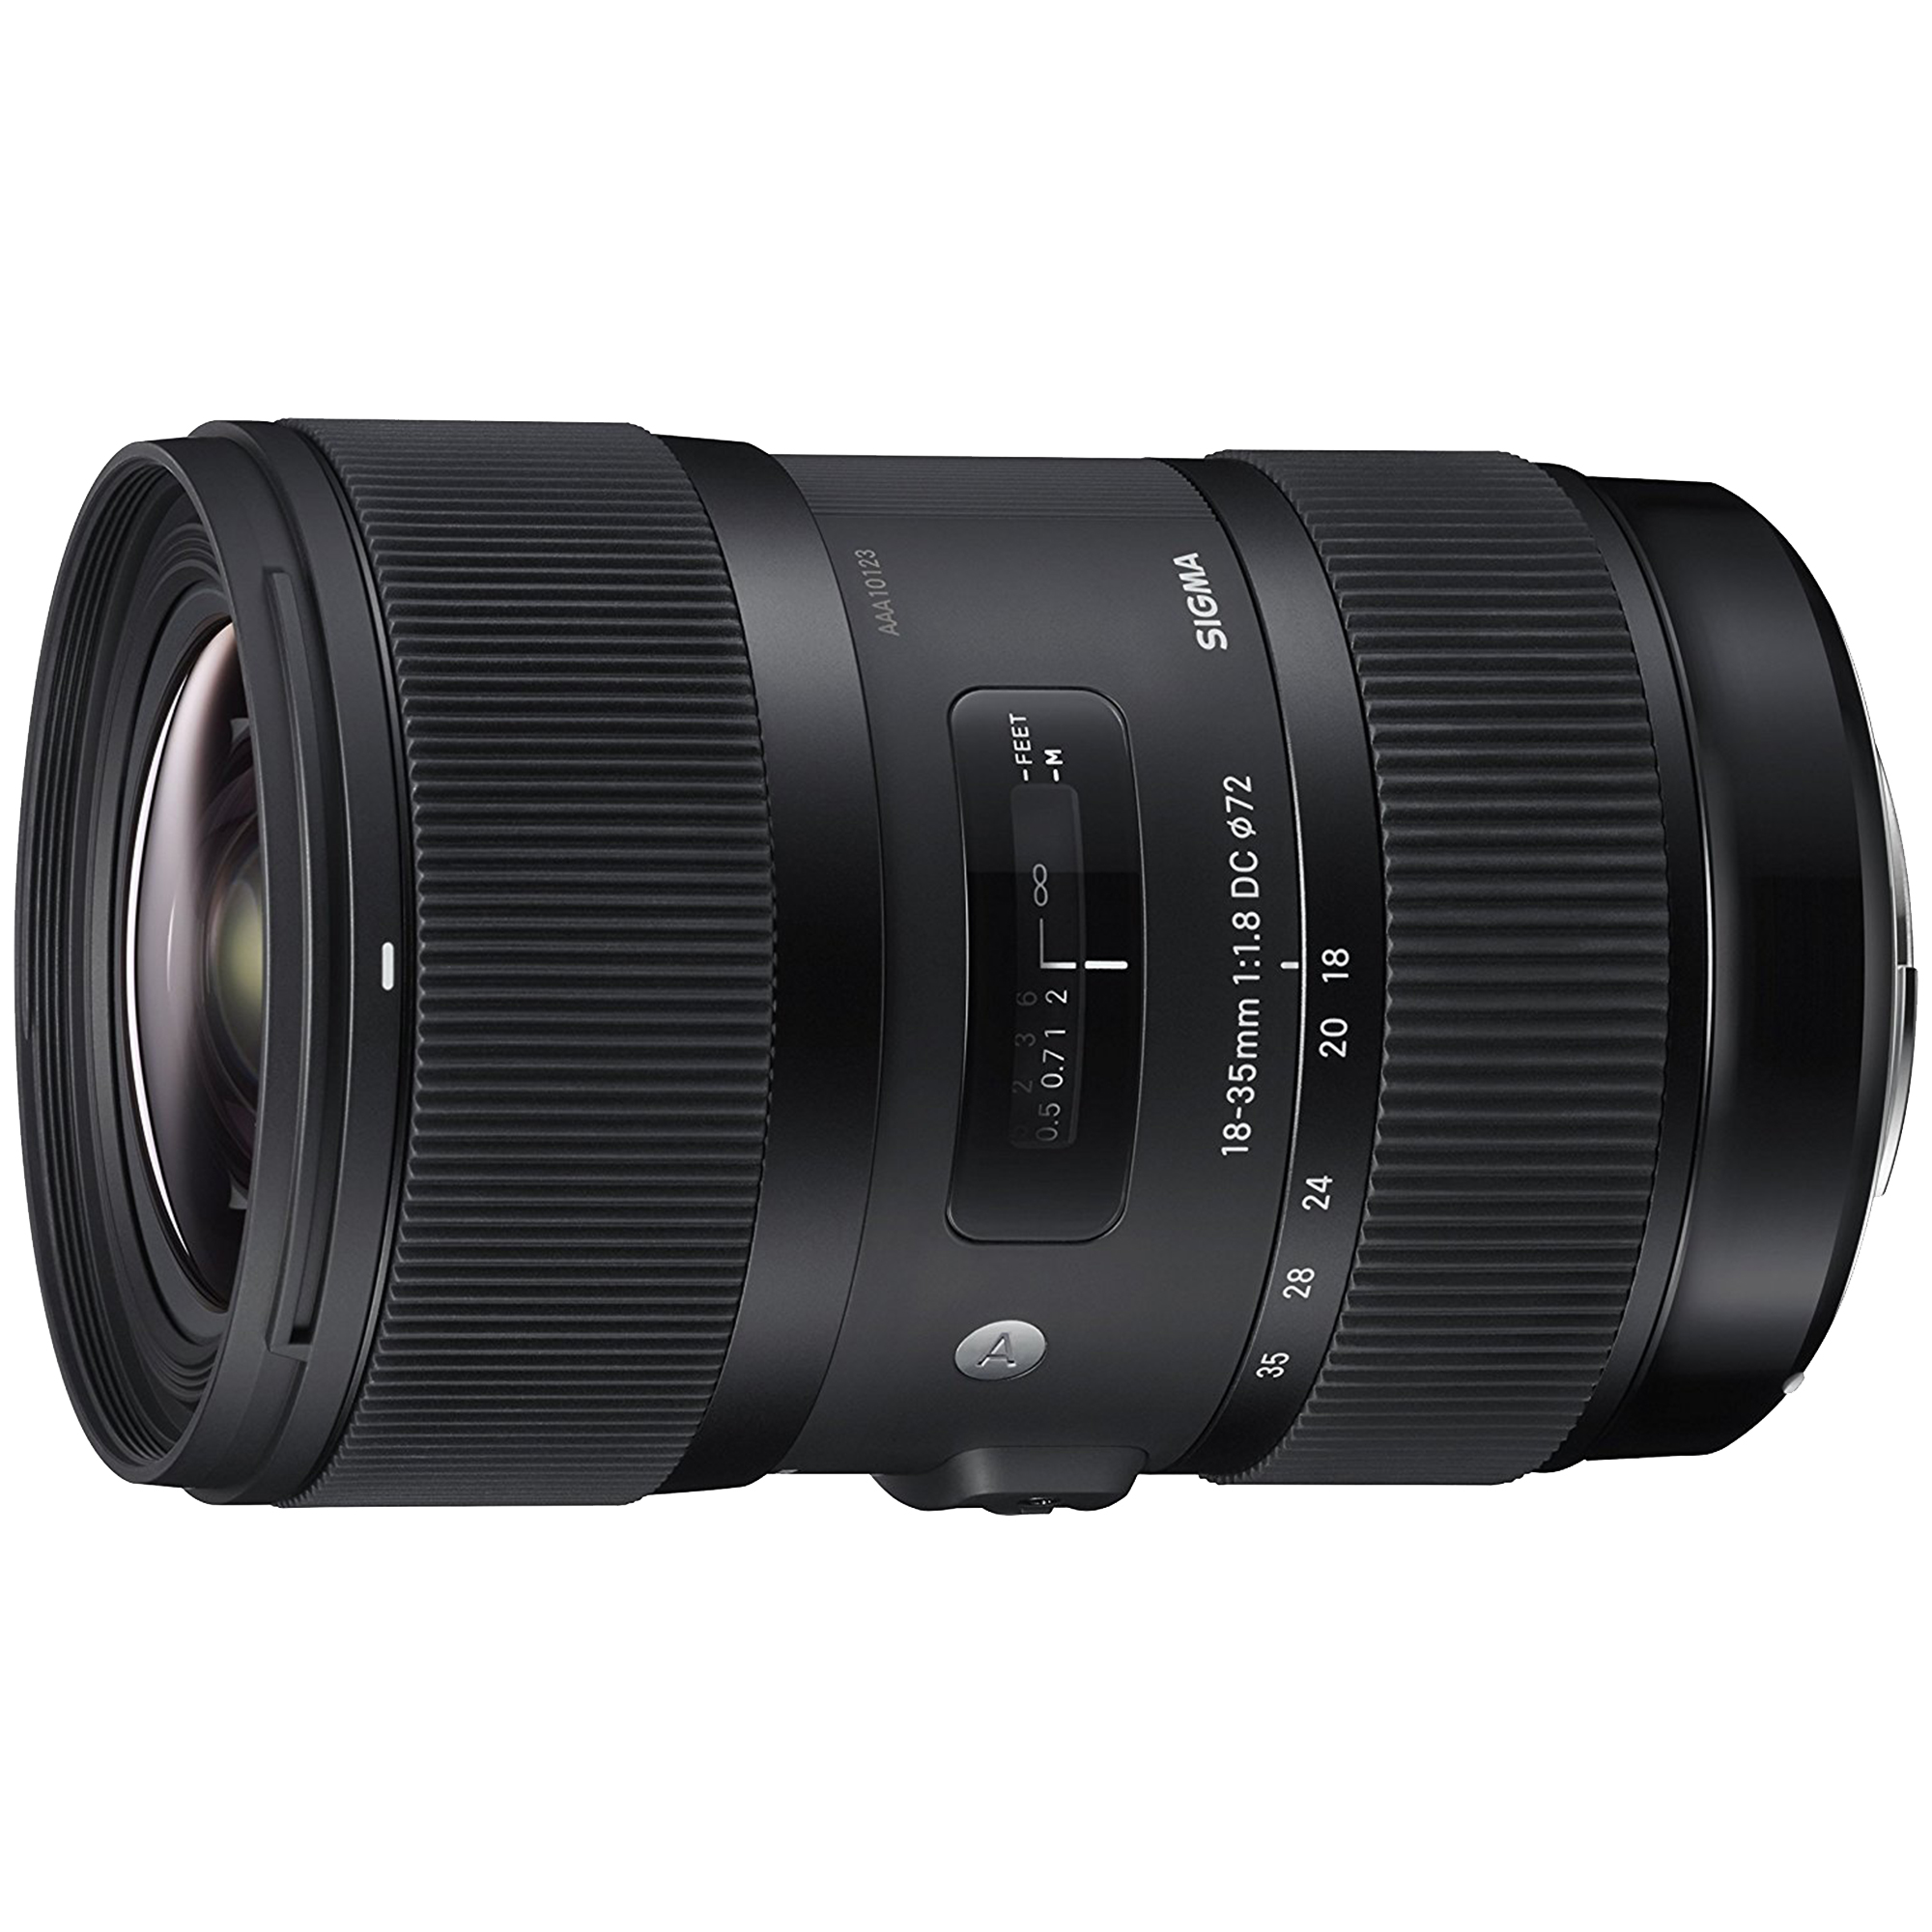 Sigma 18-35mm F1.8 DC HSM Lens -